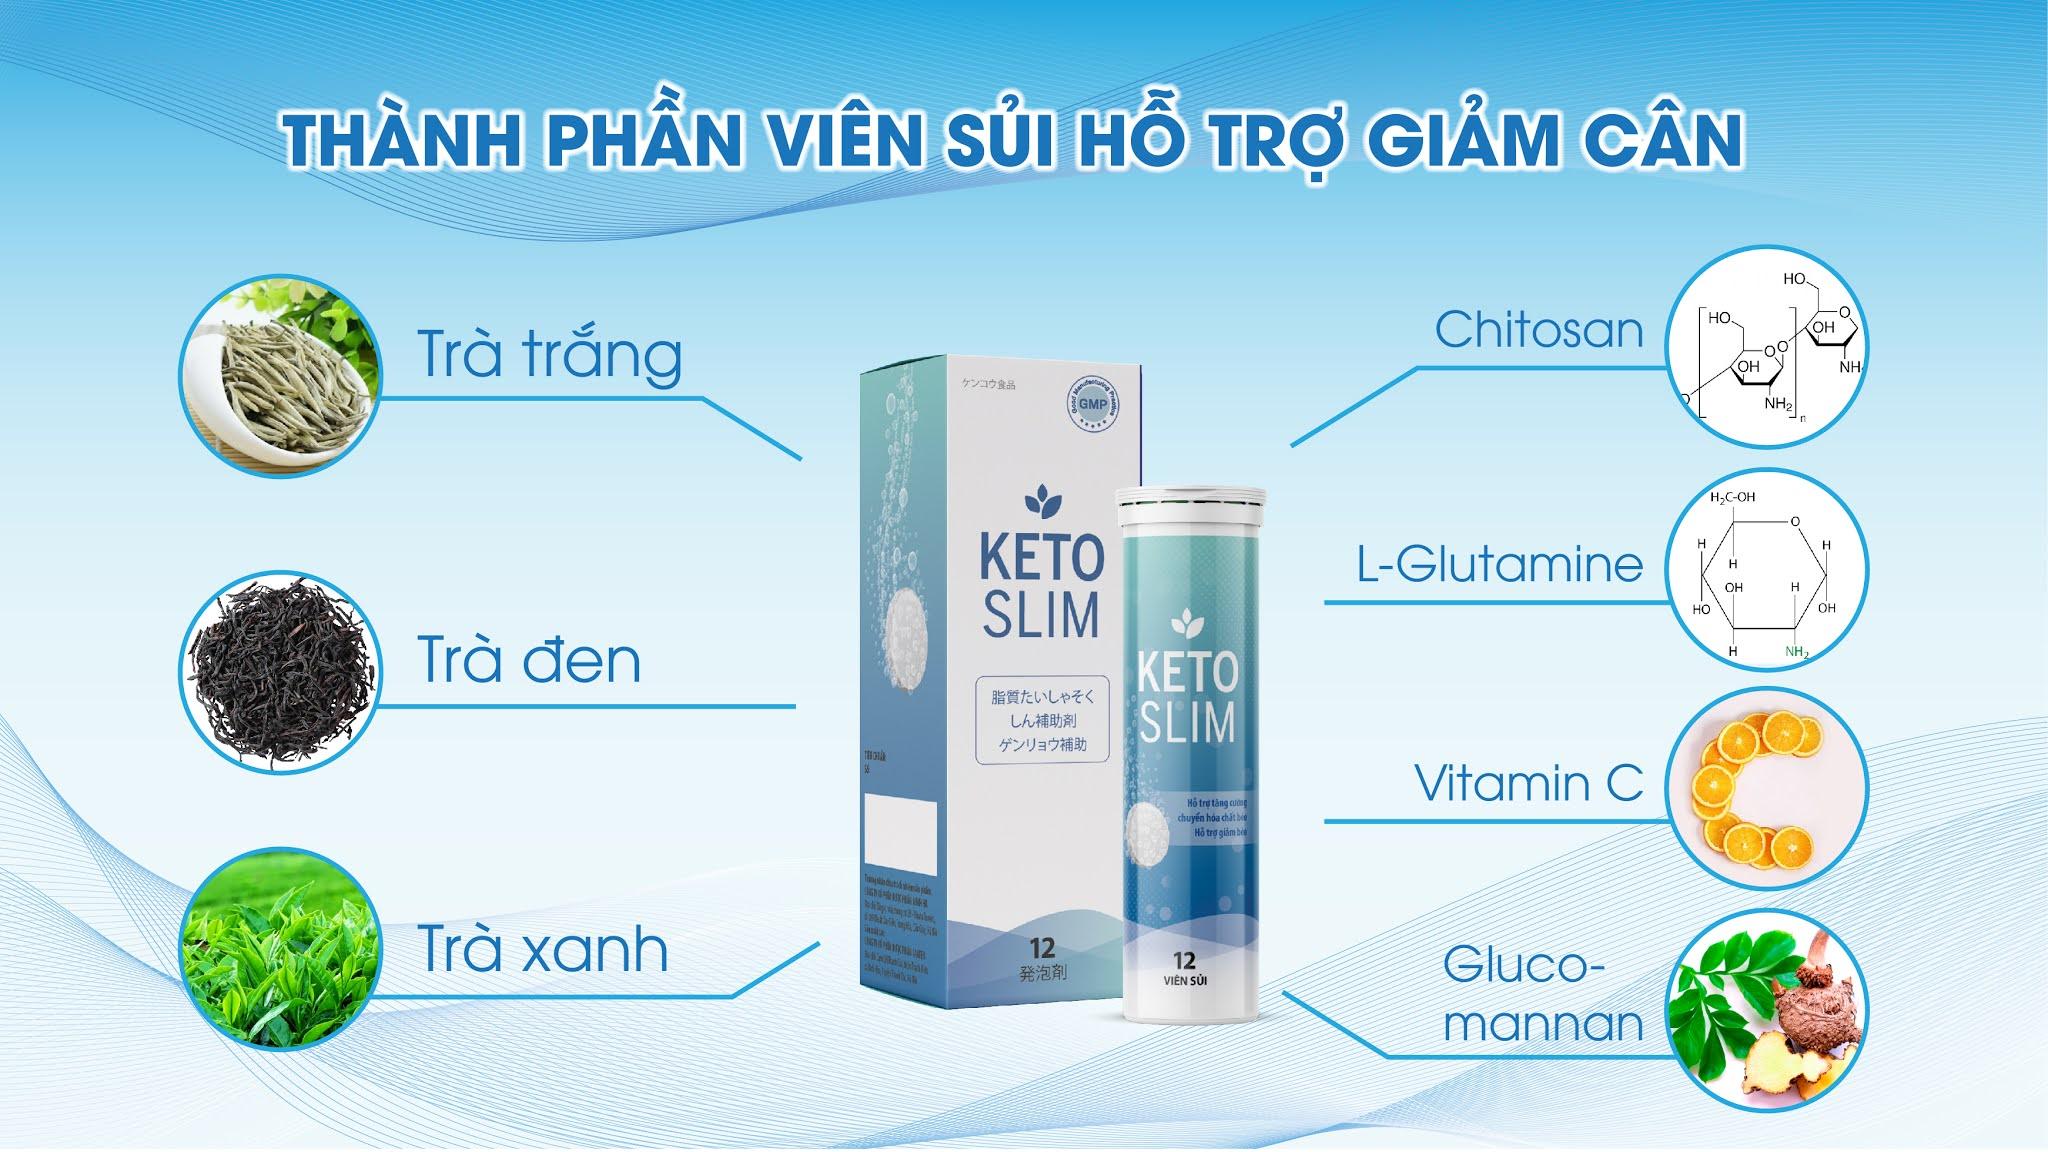 Giảm cân hiệu quả với viên sủi giảm cân Keto Slim